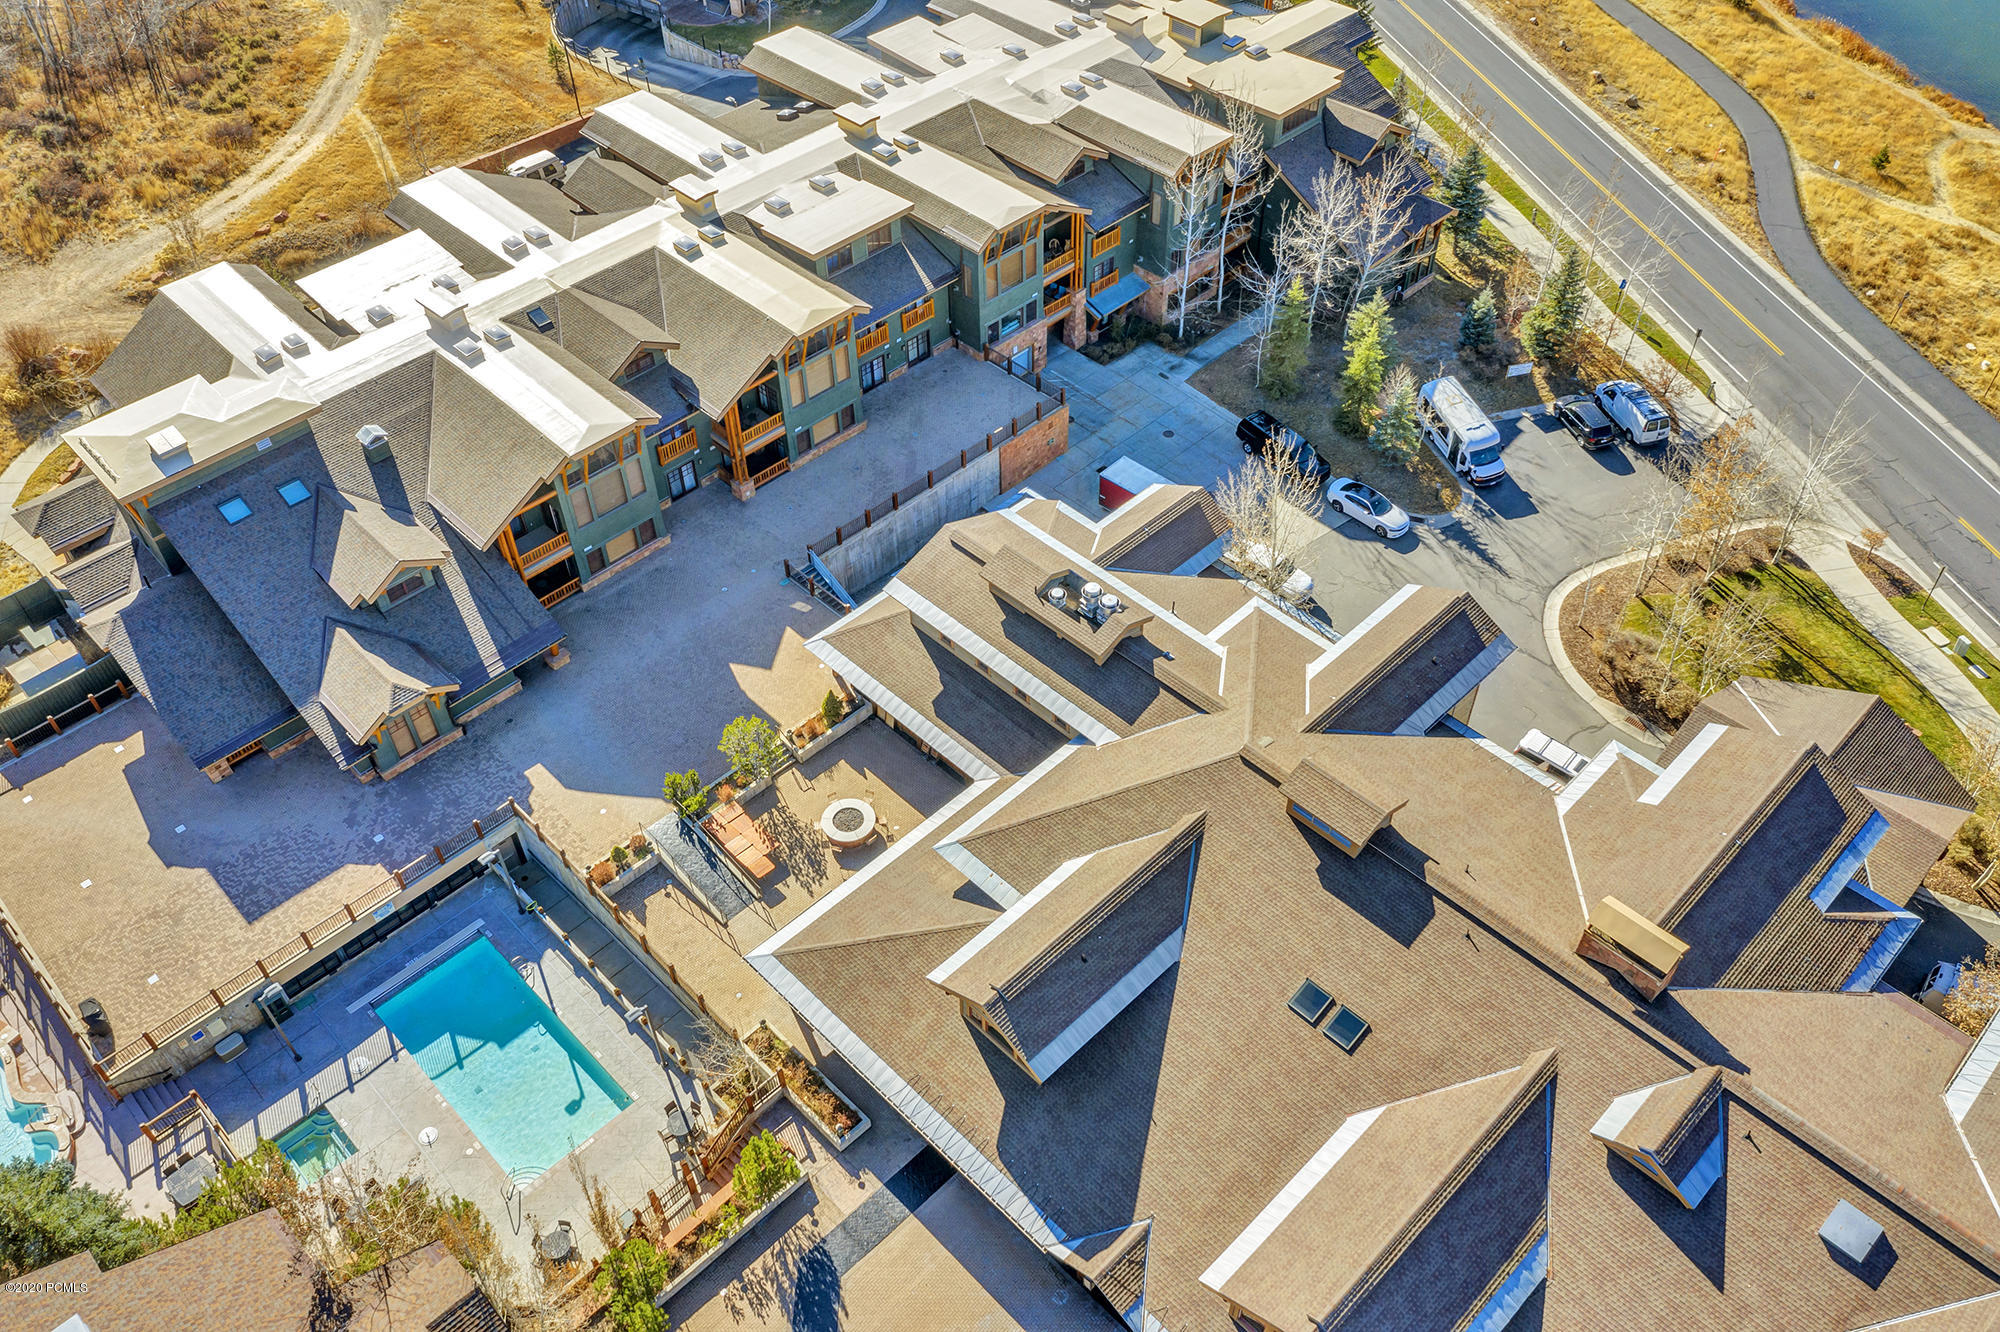 2900 Deer Valley Drive, Park City, Utah 84060, 2 Bedrooms Bedrooms, ,3 BathroomsBathrooms,Condominium,For Sale,Deer Valley,12004401